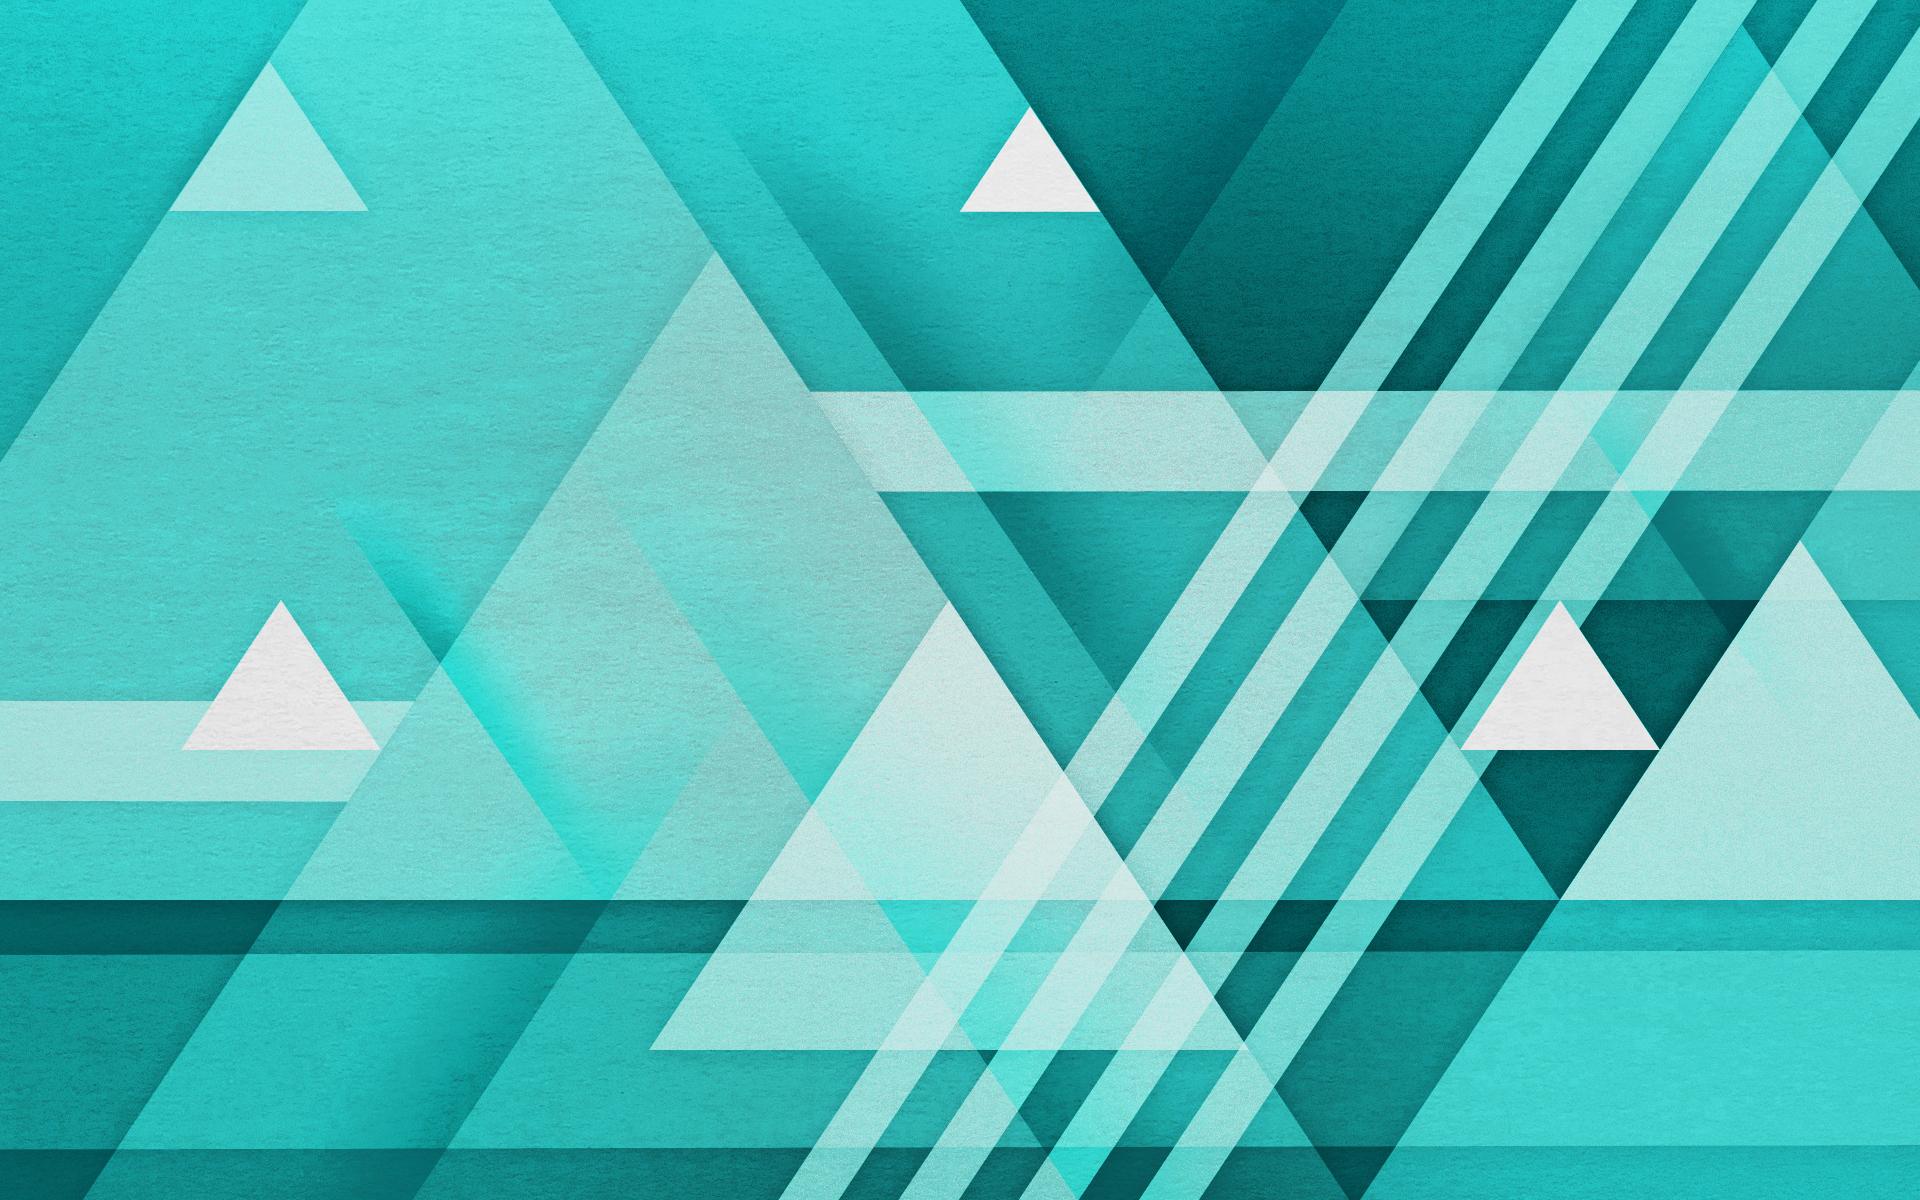 Cool Shapes Wallpaper